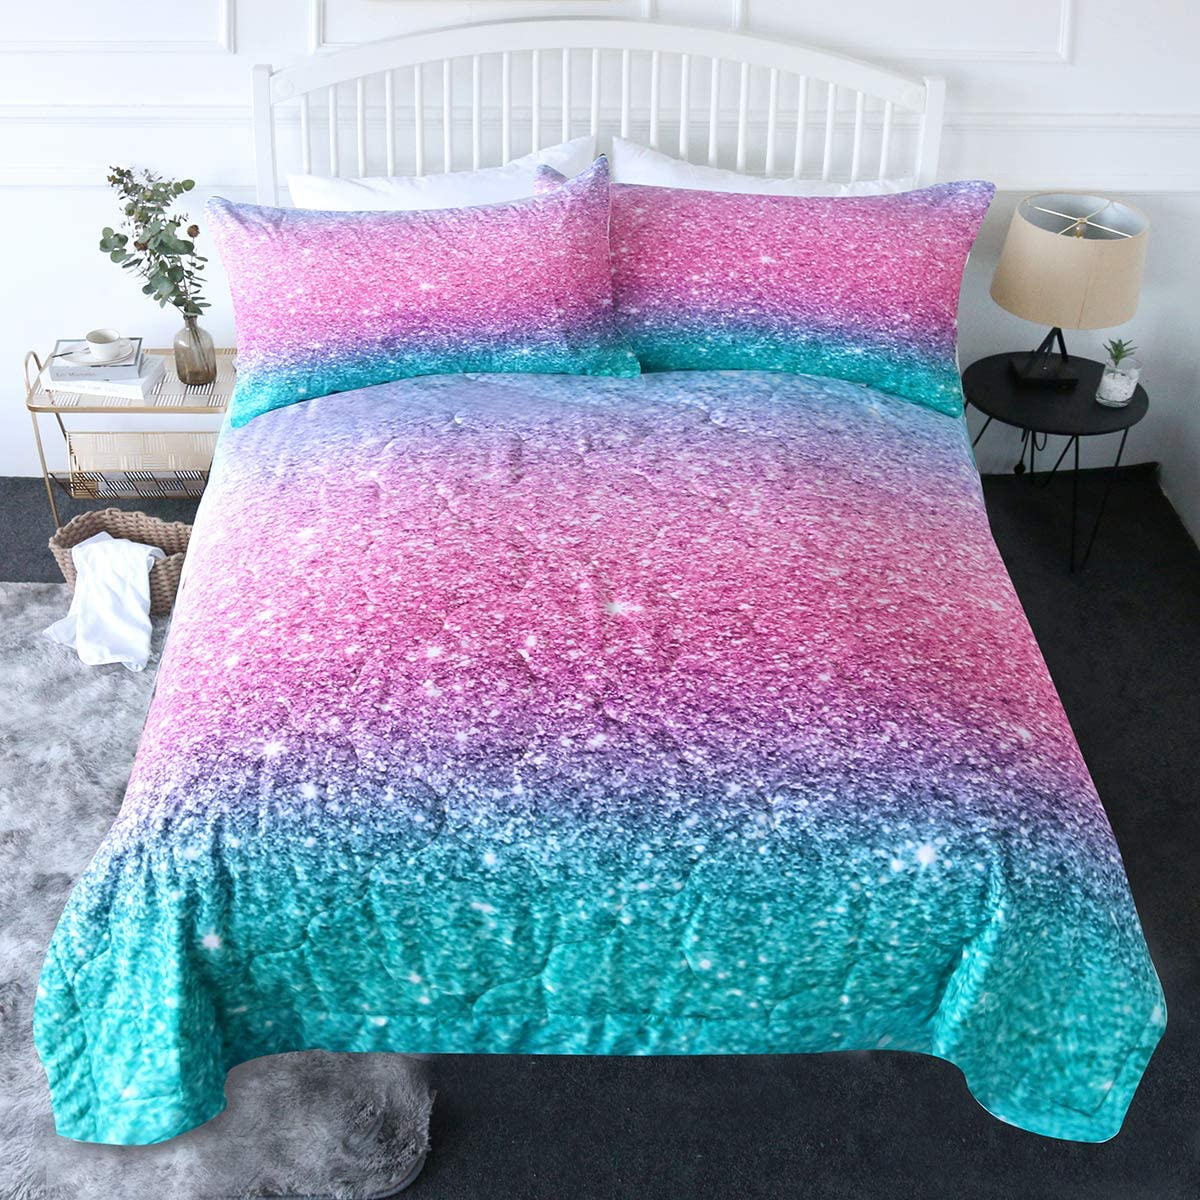 blessliving 3 piece comforter set 3d printed pink glitter bedding set with pillow shams girls women reversible comforter twin size bedding sets